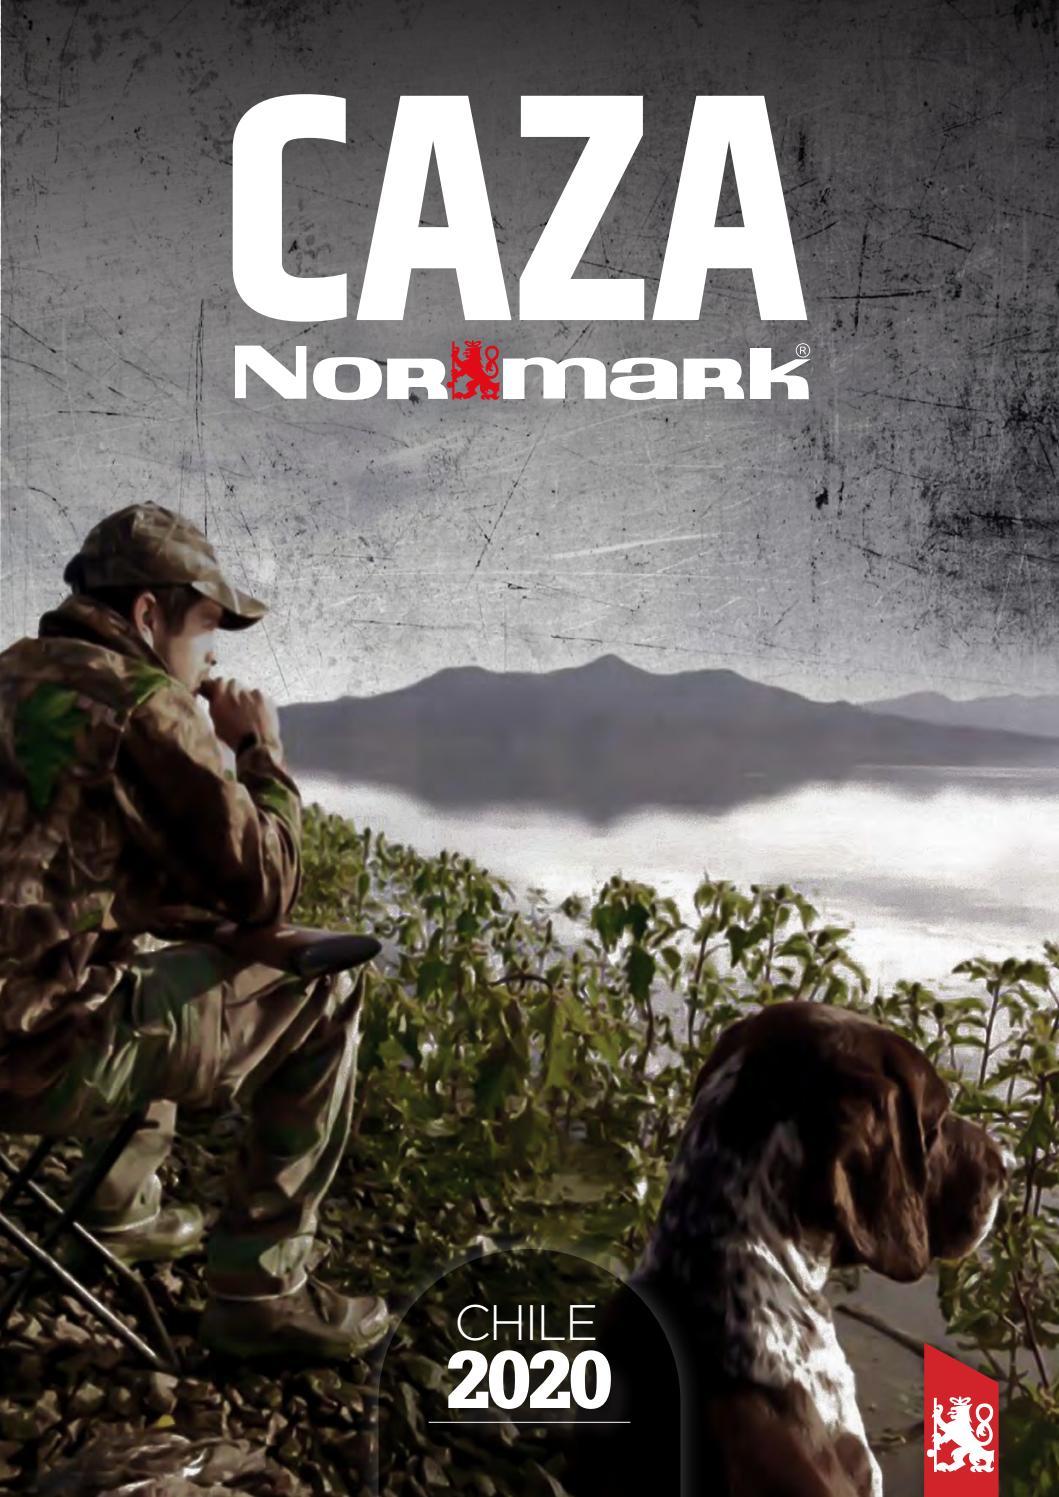 CATALOGO PESCA/CAZA